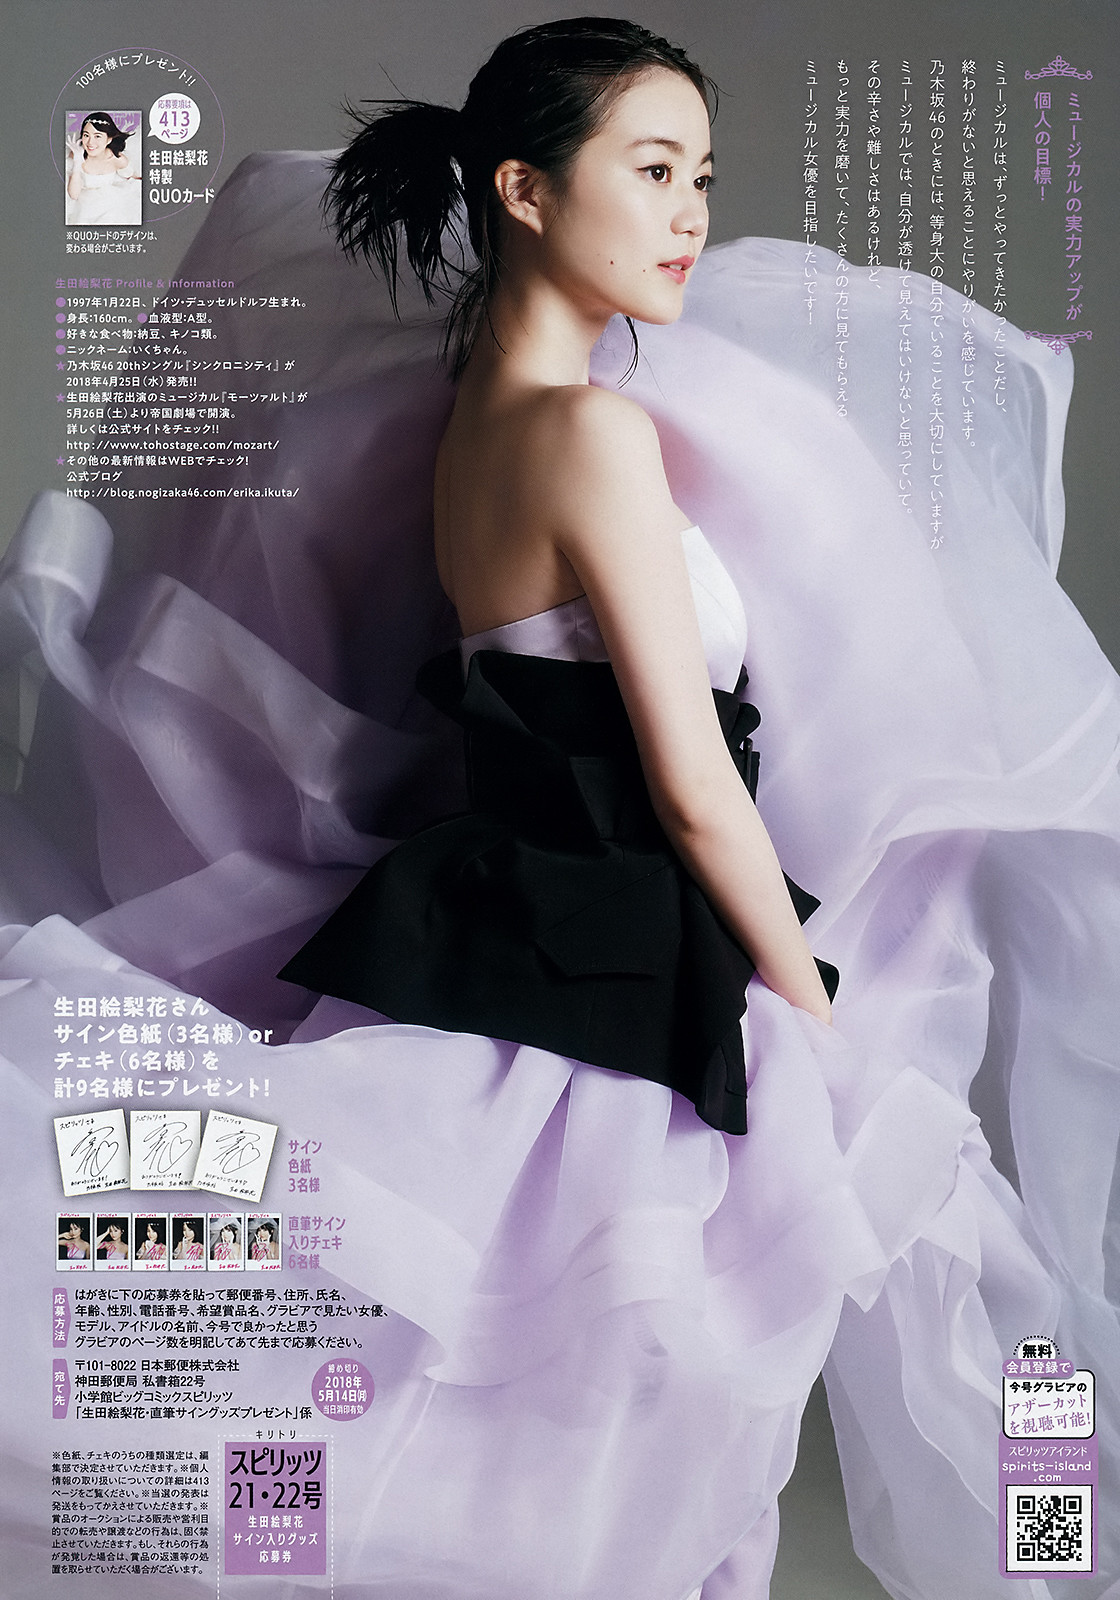 Ikuta Erika 生田絵梨花, Big Comic Spirits 2018 No.21-22 (週刊スピリッツ 2018年21-22号)